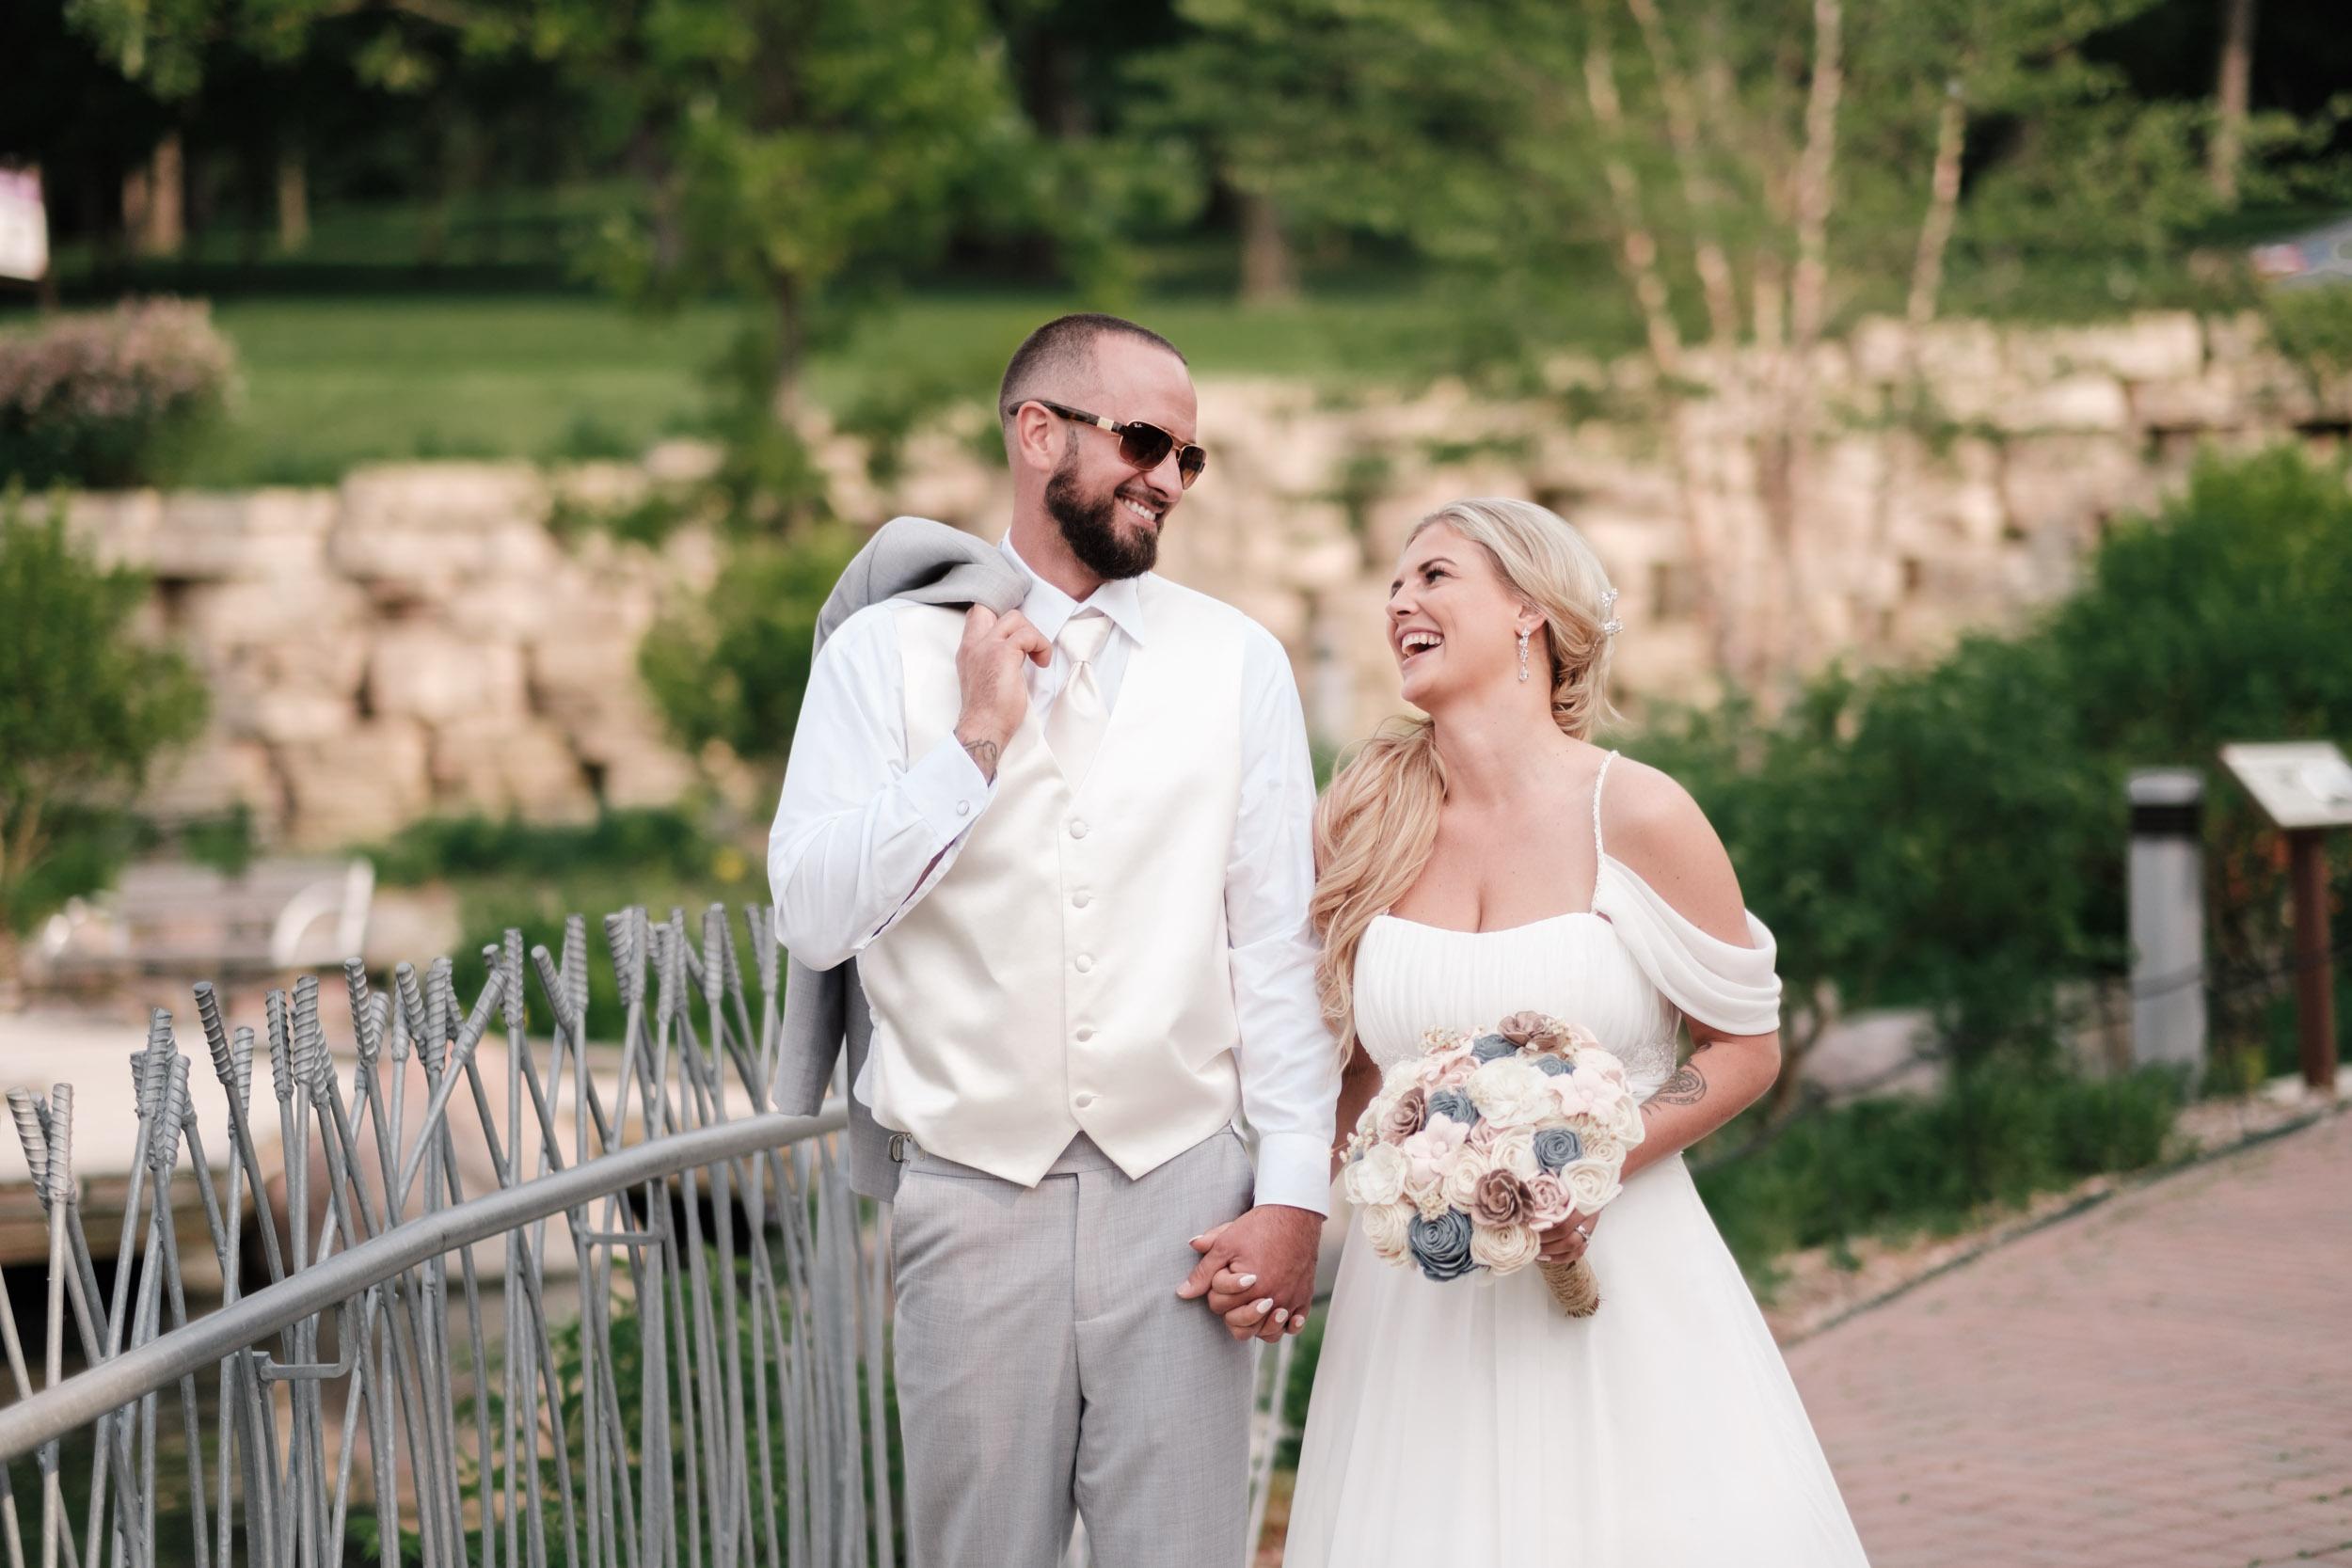 rockford candid wedding couple laughing on bridge